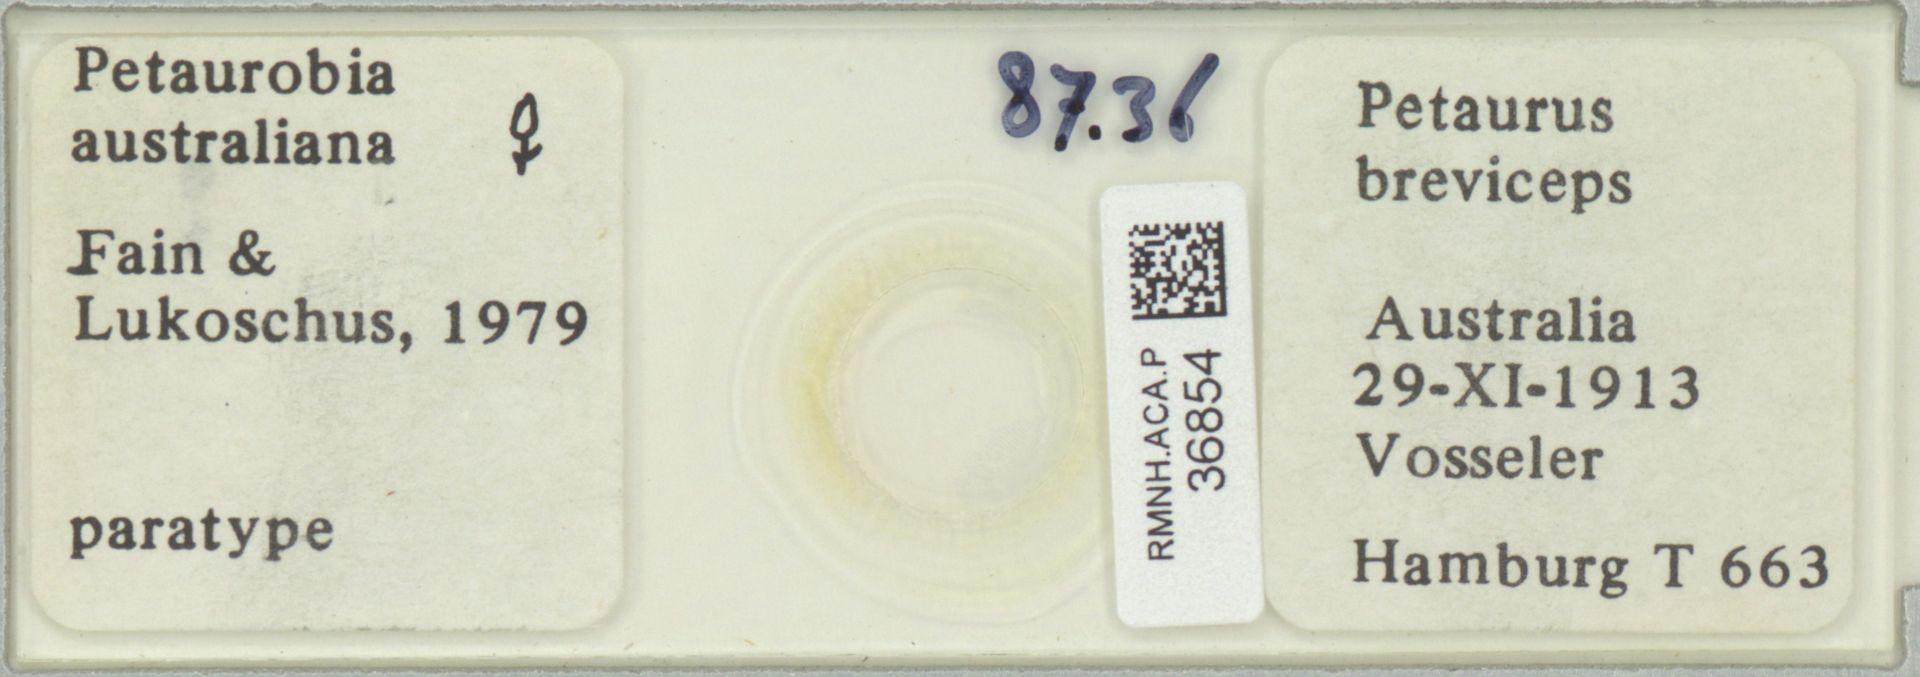 RMNH.ACA.P.36854 | Petaurobia australiana Fain & Lukoschus, 1979